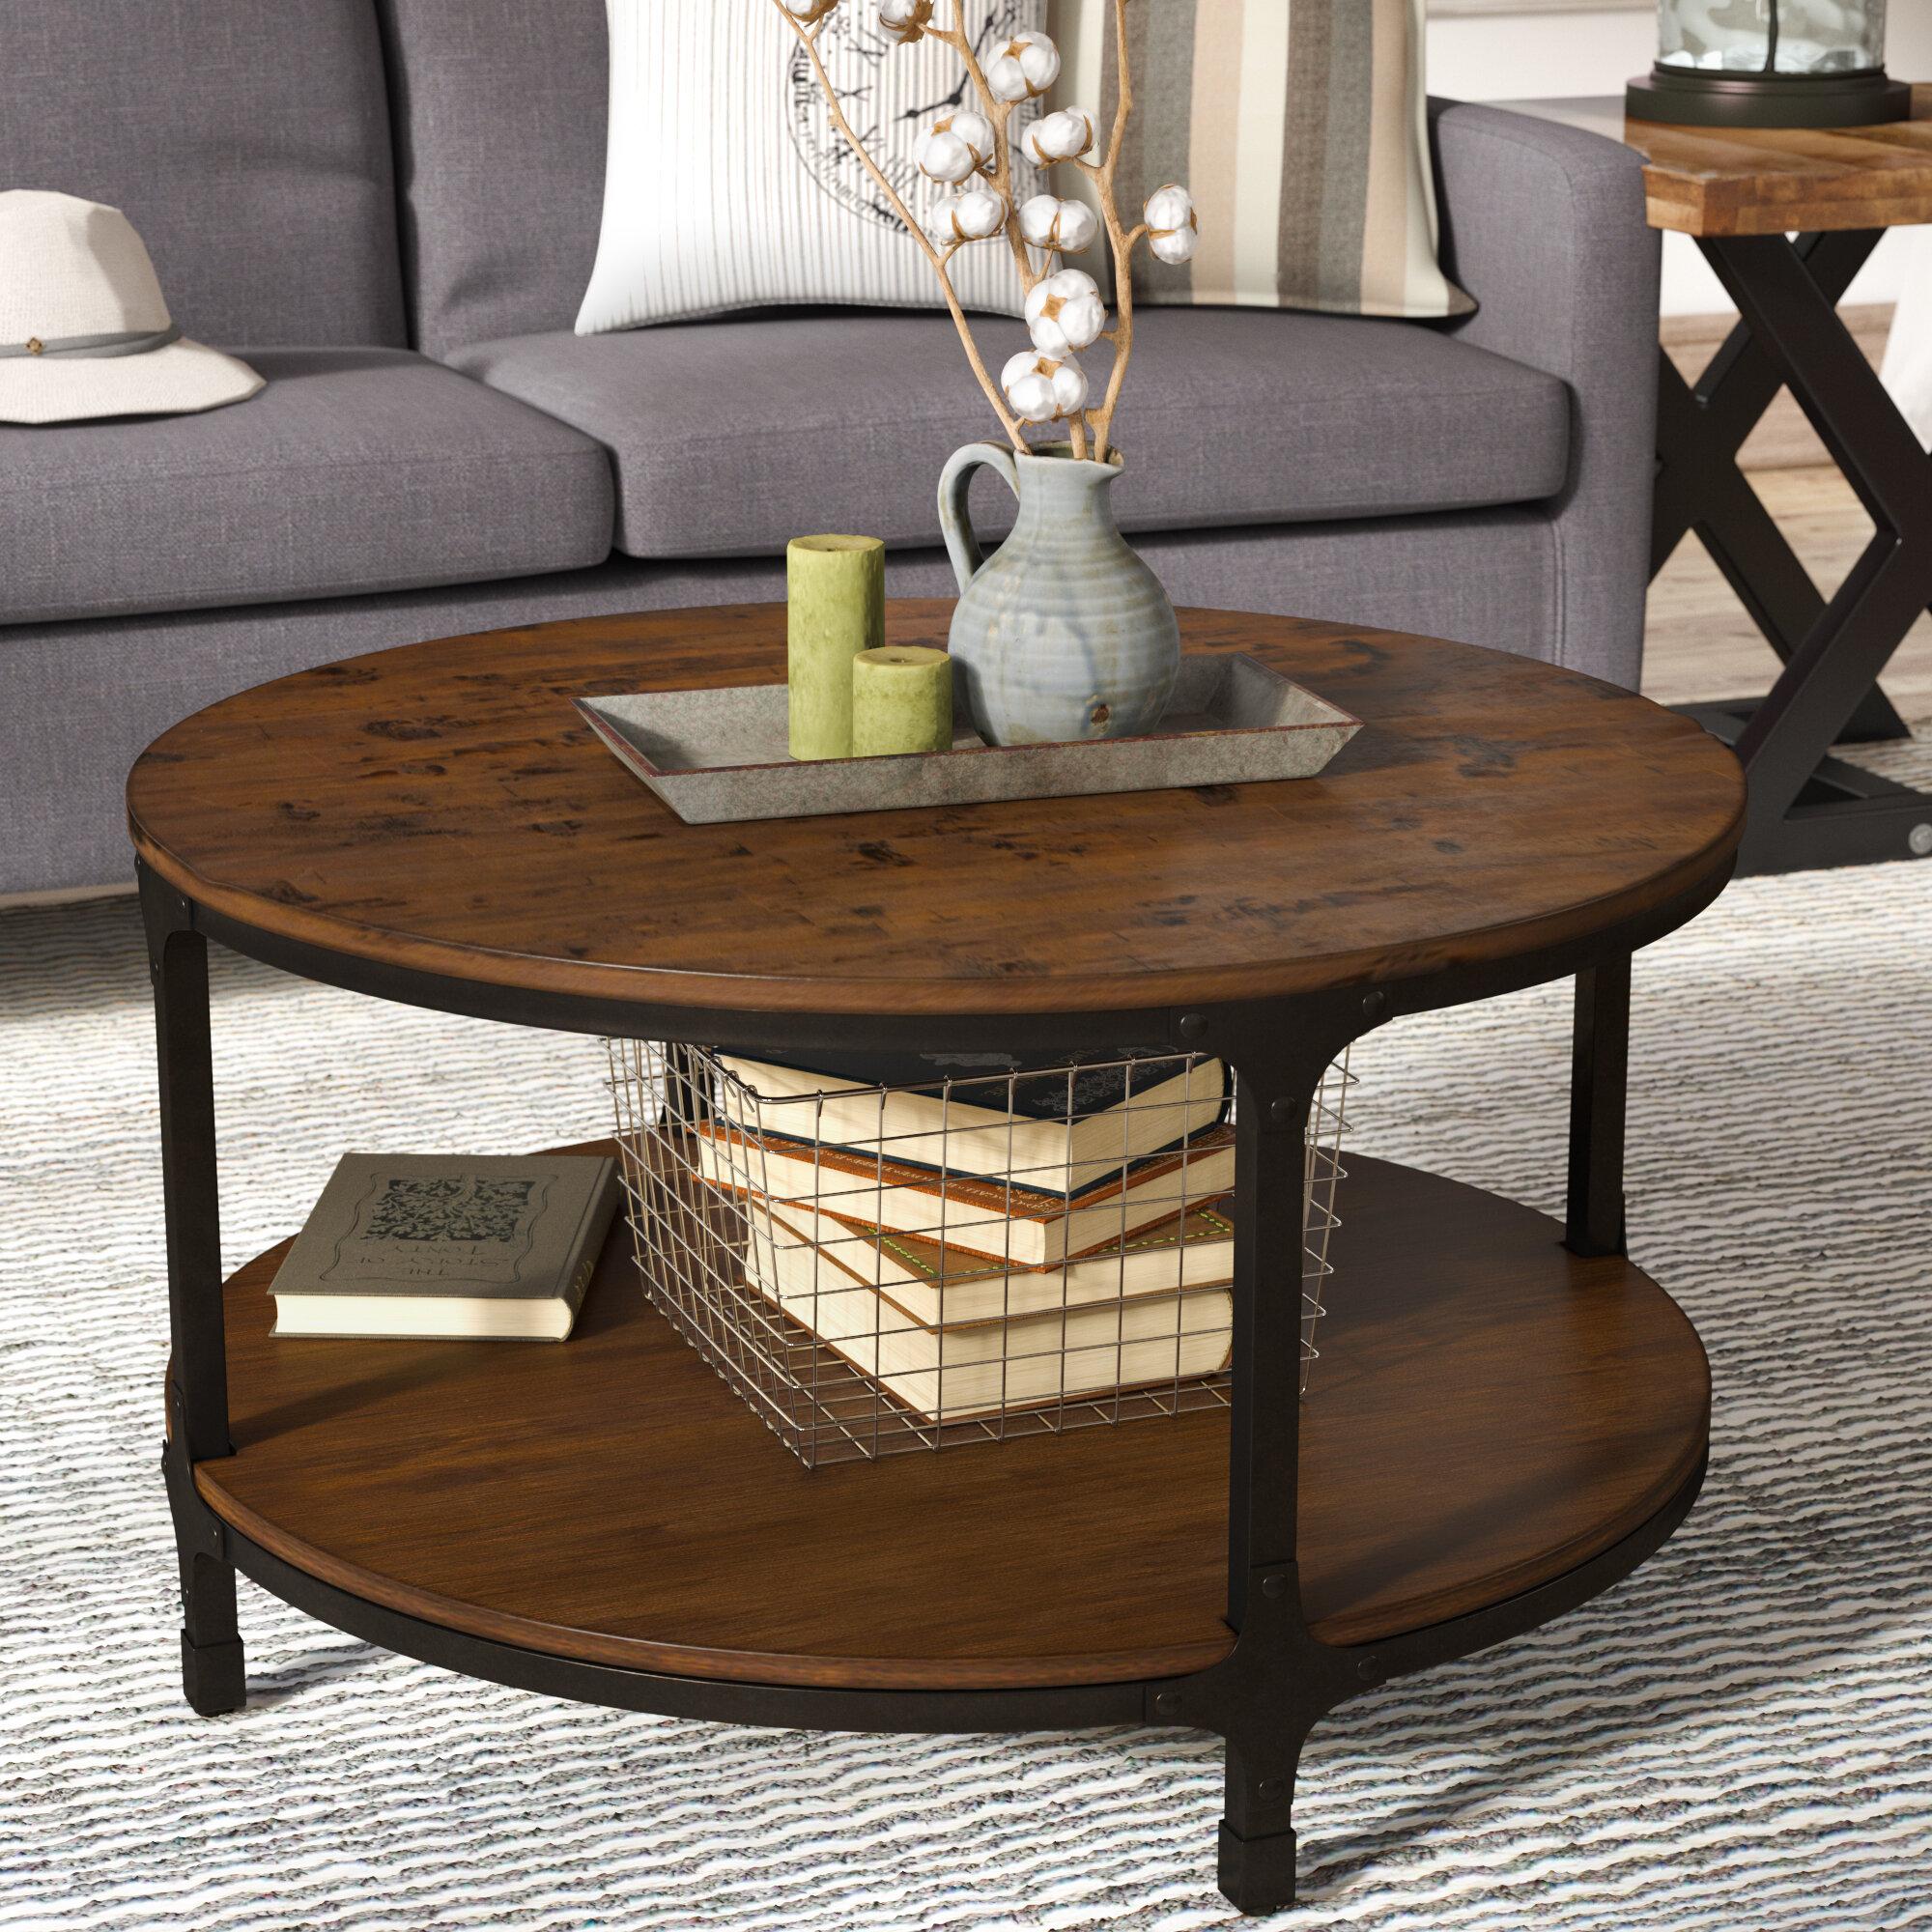 Ordinaire Laurel Foundry Modern Farmhouse Carolyn Coffee Table U0026 Reviews | Wayfair